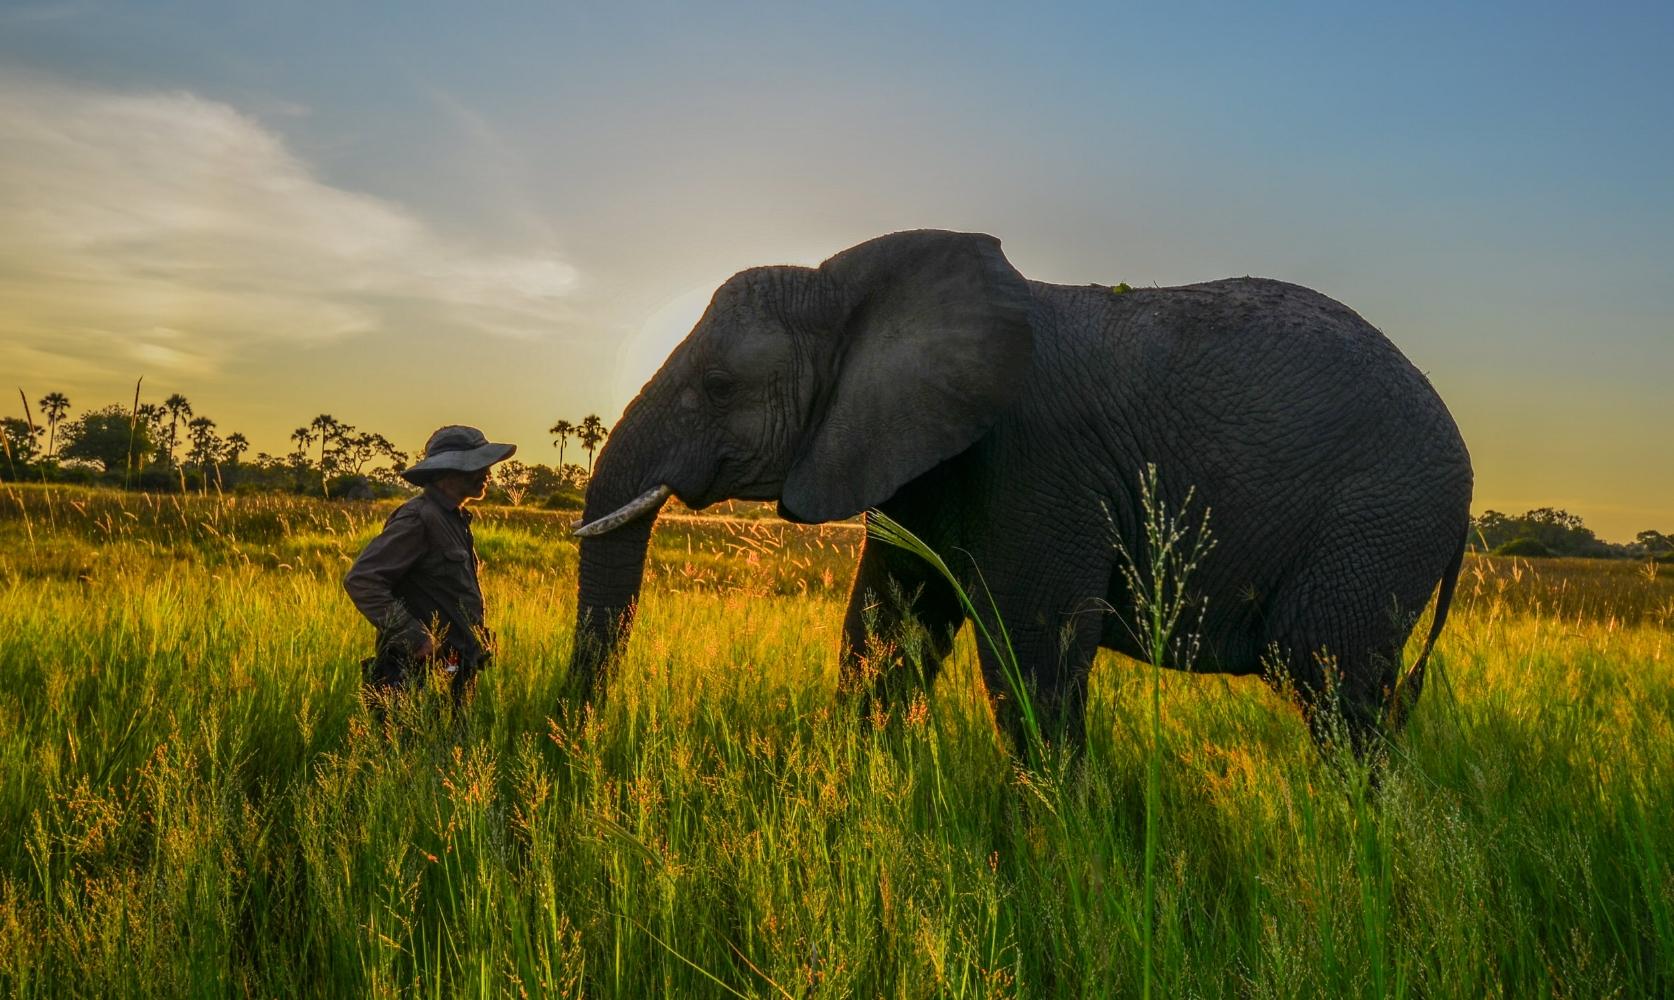 Thembi with Doug in the Okavango sunset